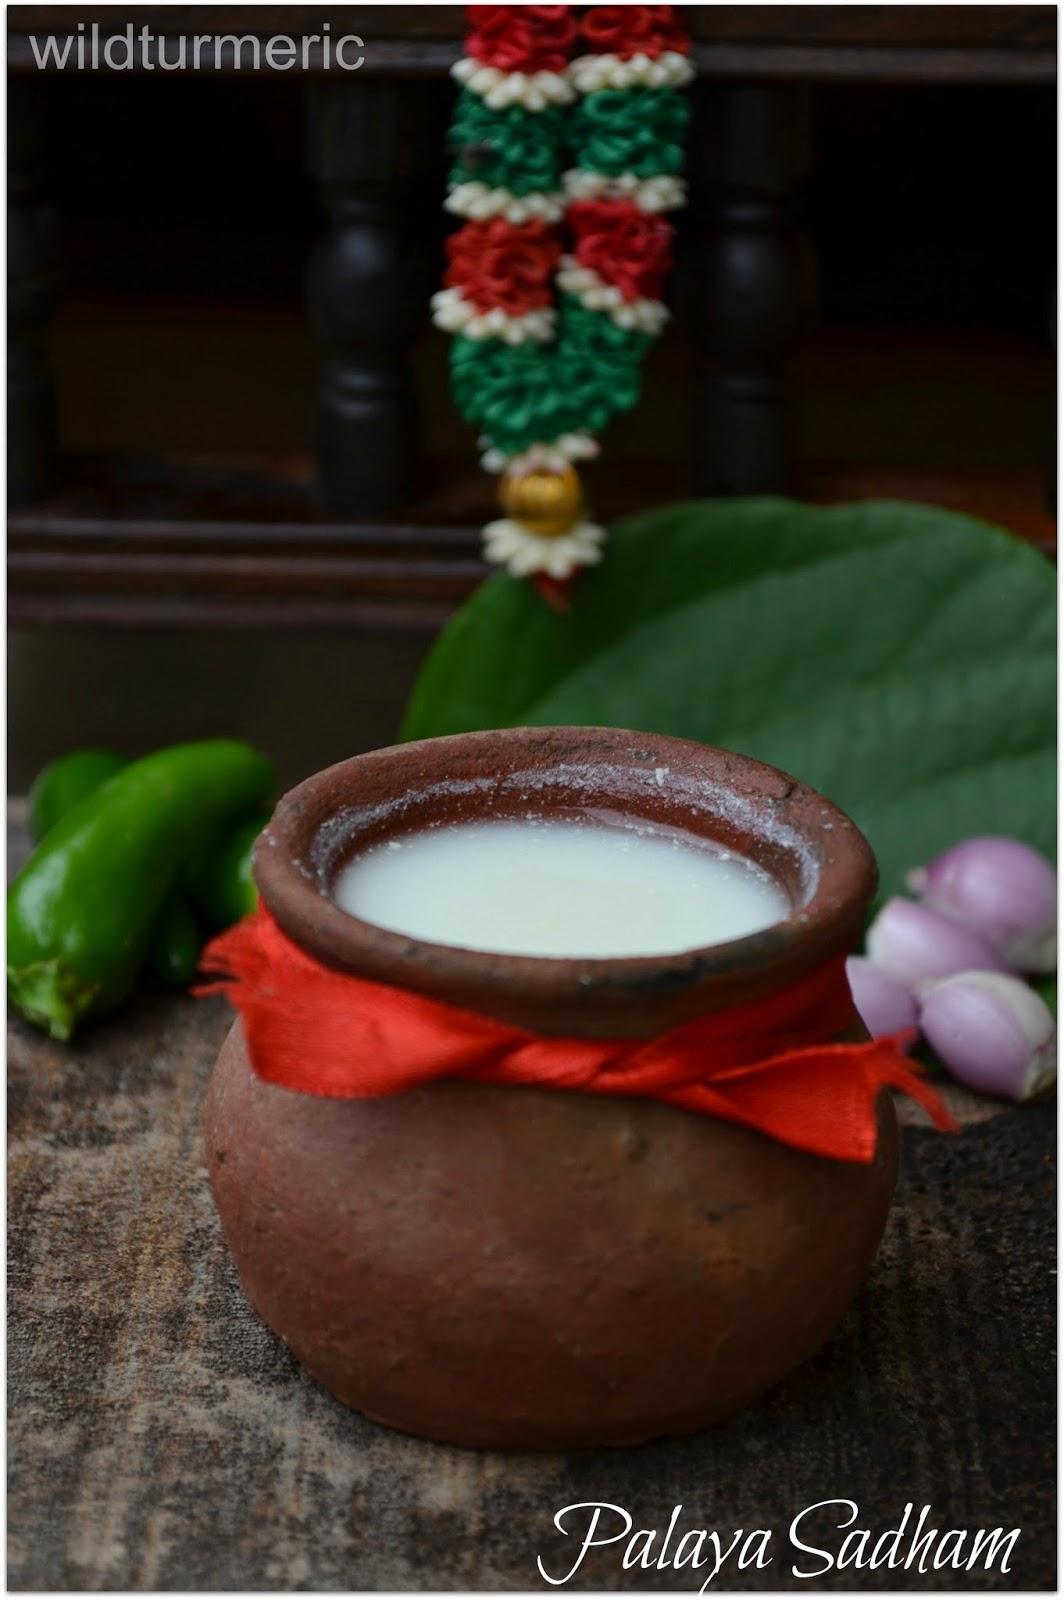 Neeragaram / Palaya Satham Health Benefits: Cure for Stomach Burns